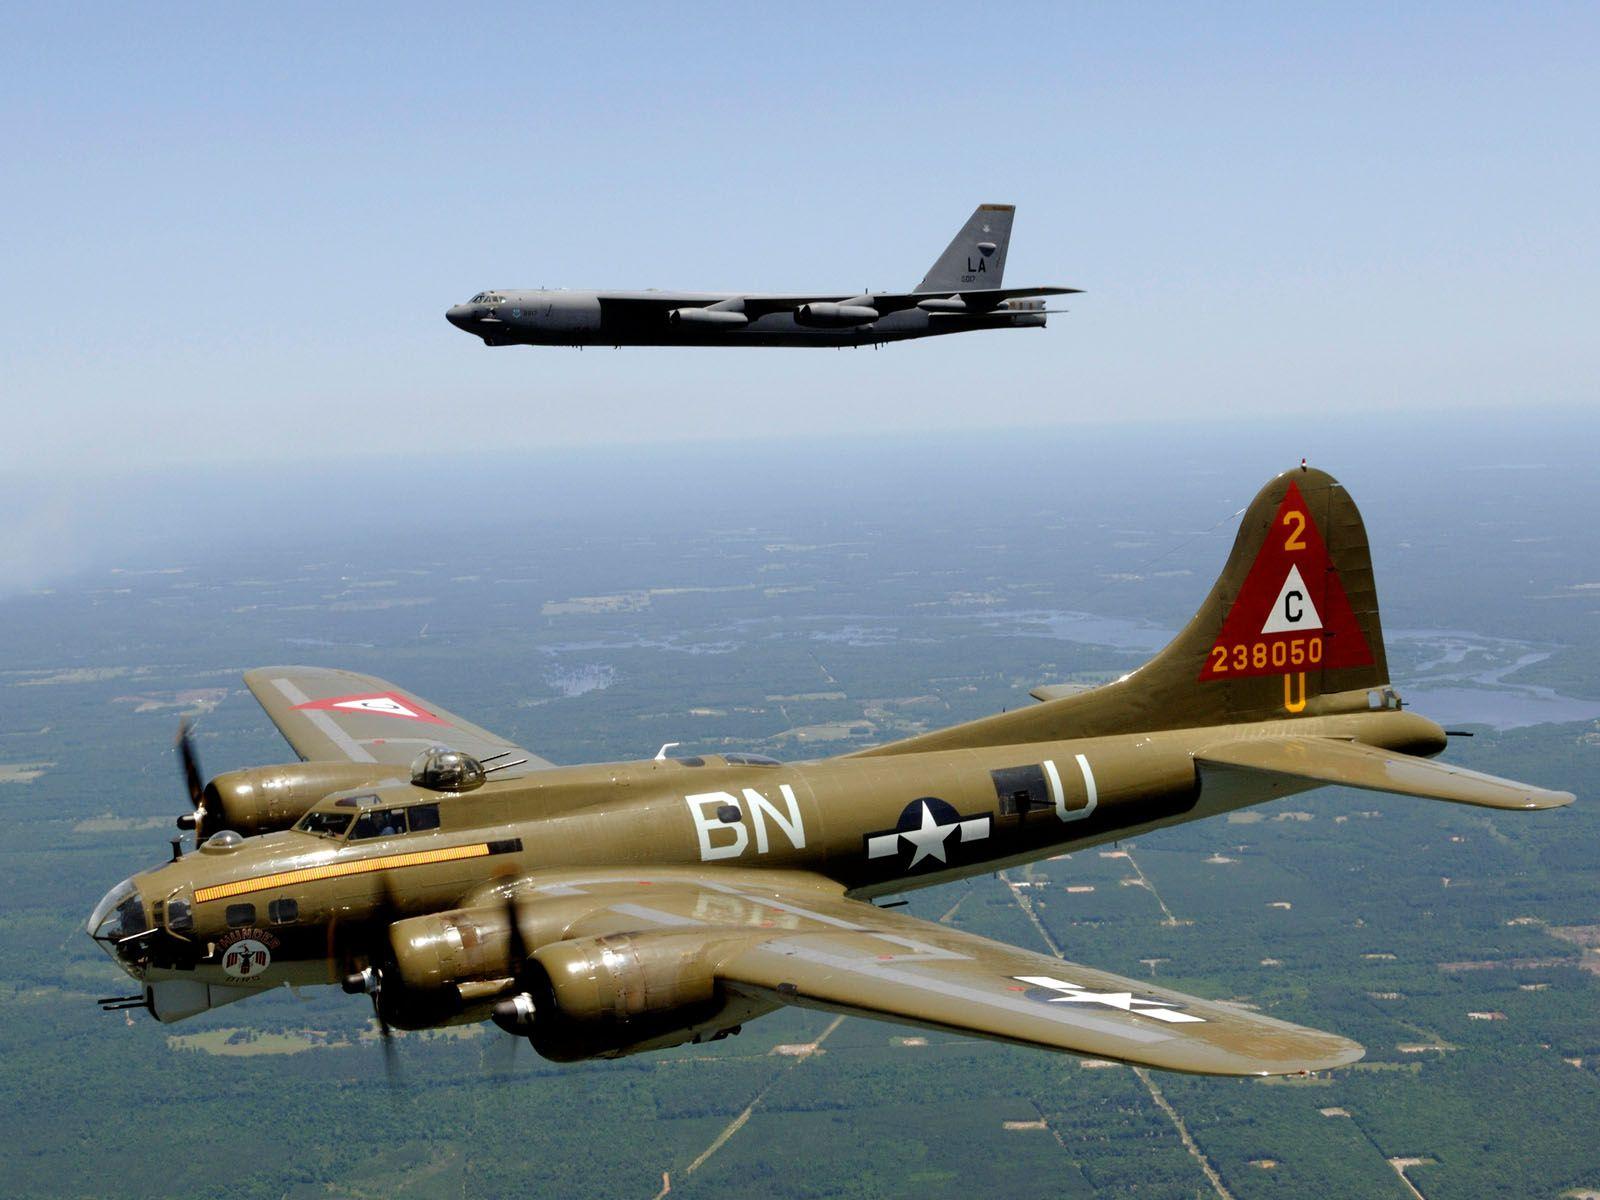 B-17 \u0026 B-52 The aviation equivalent of Veterans Day | Aviation ...